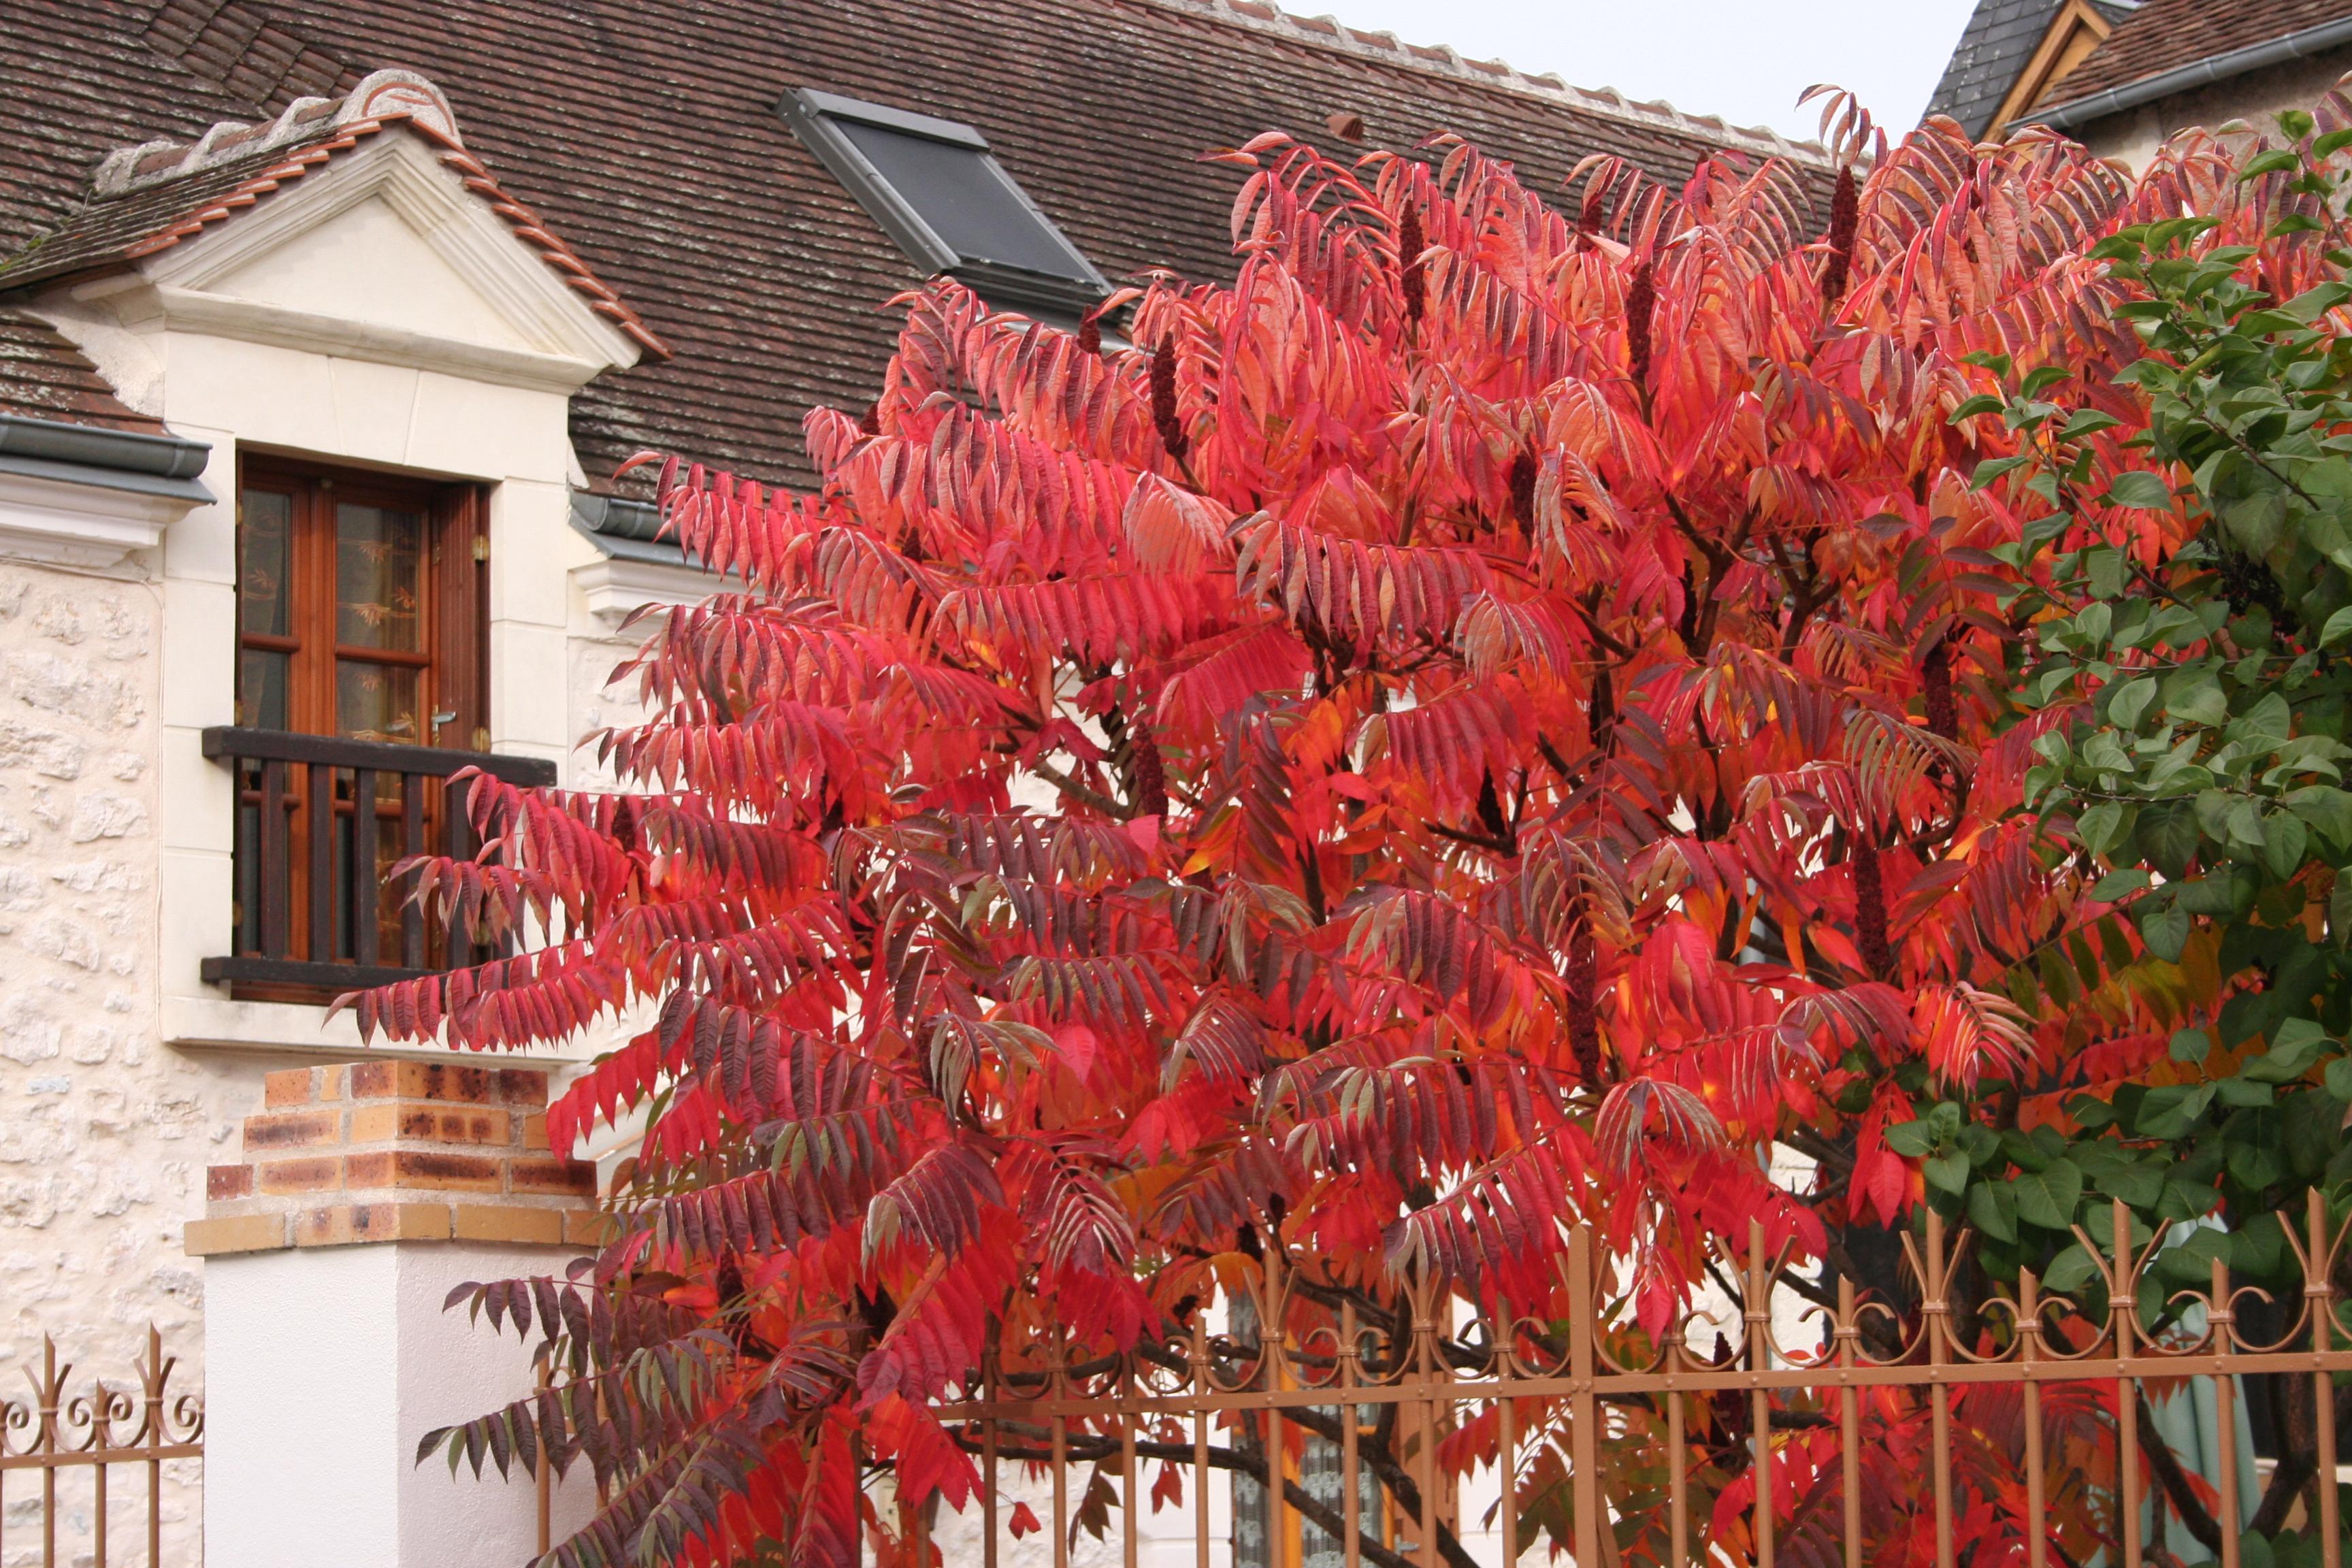 Rhus showing autumn colour in a Chabris garden